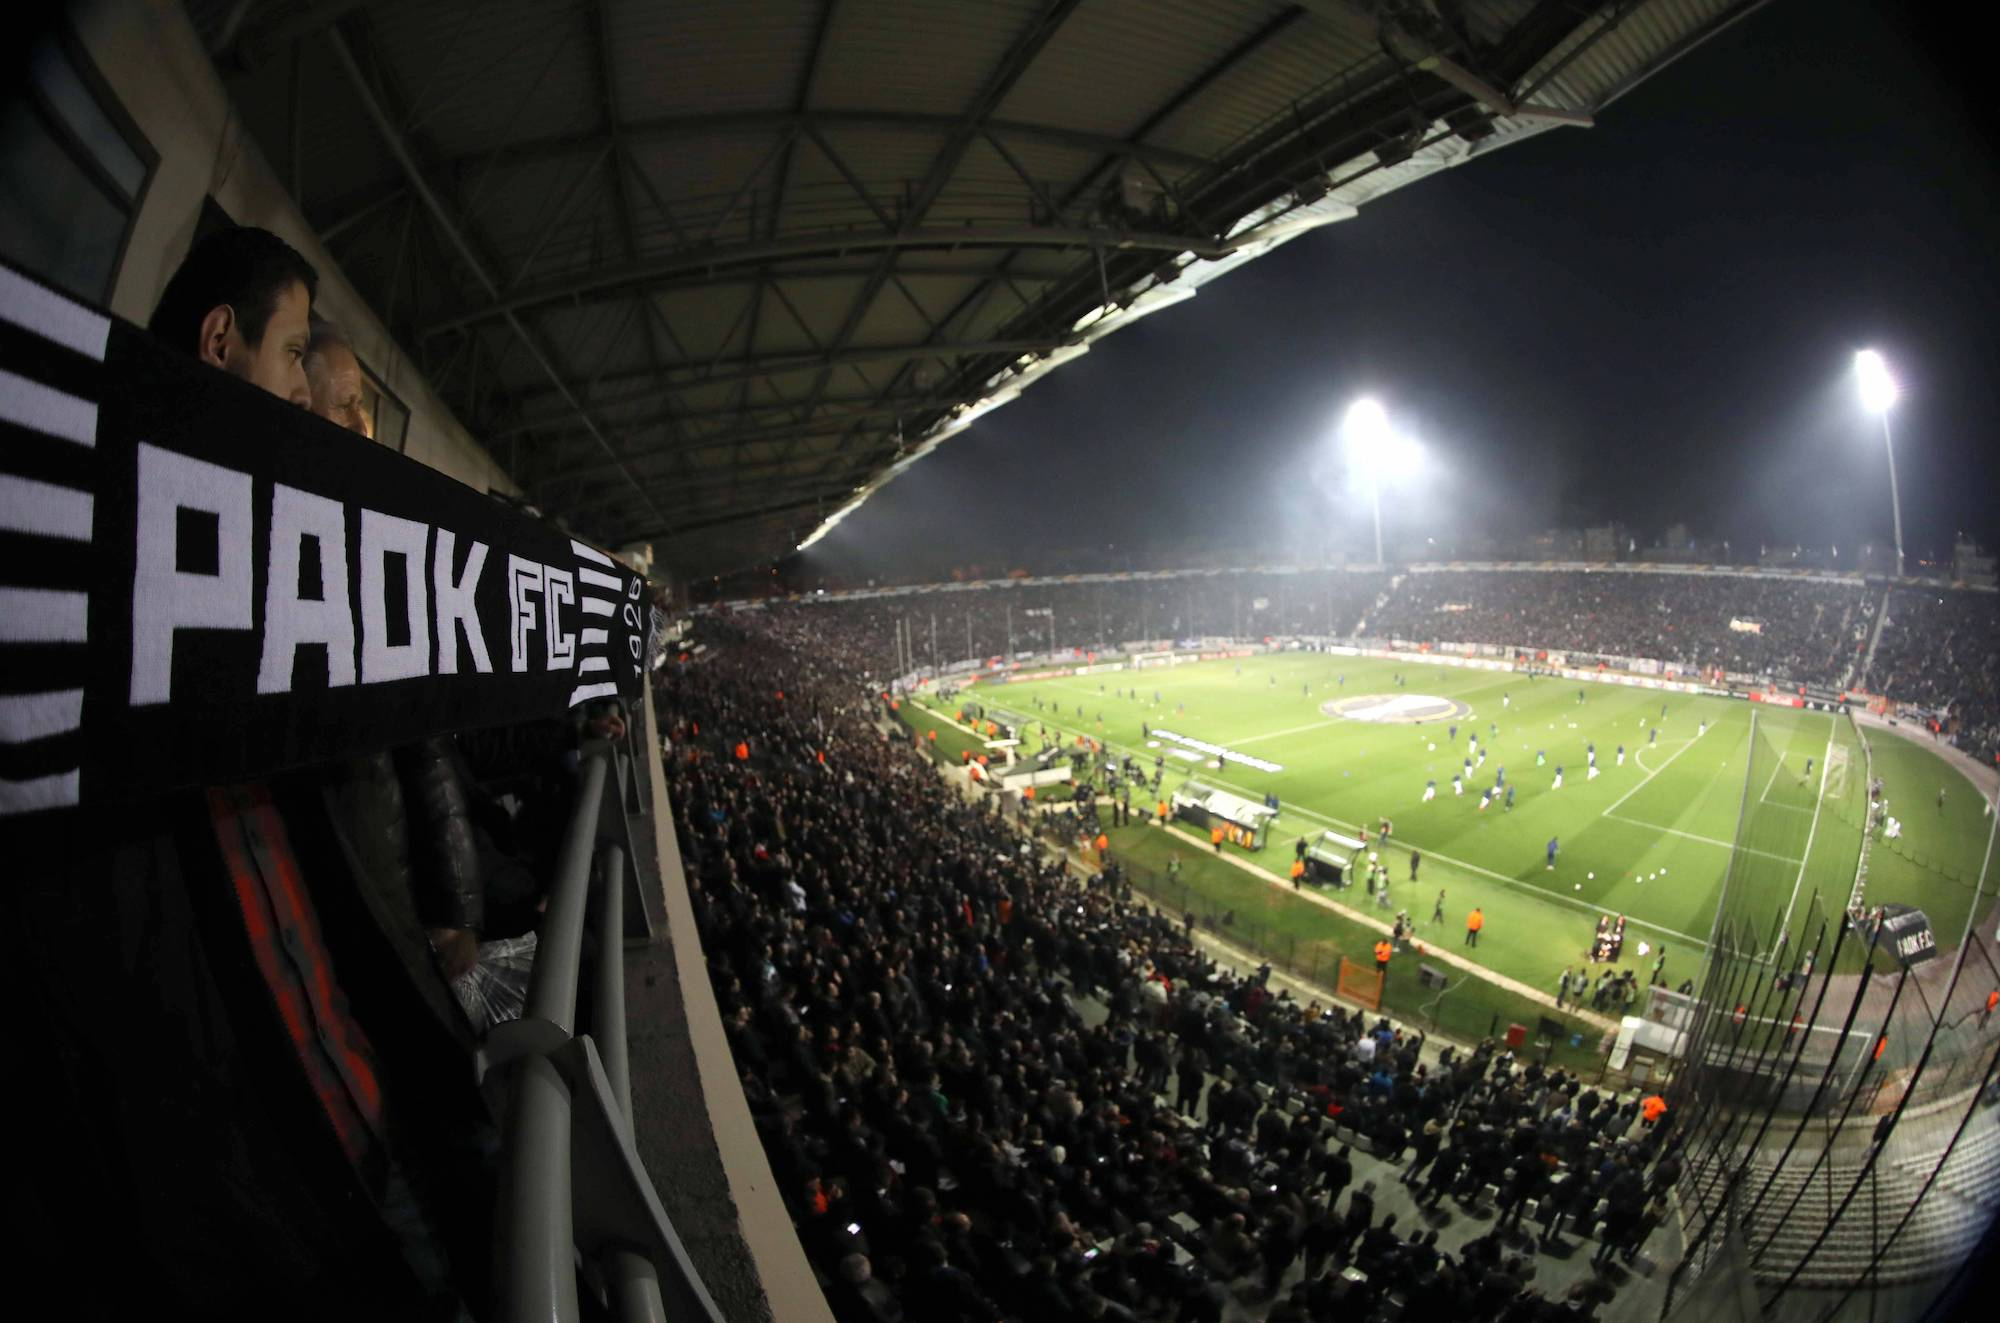 Fussball Europa League Stadio Toumba - Salonika 16.02.2017 Round of 32, 1st leg PAOK Thessaloniki - Schalke 04 Fans von PAOK